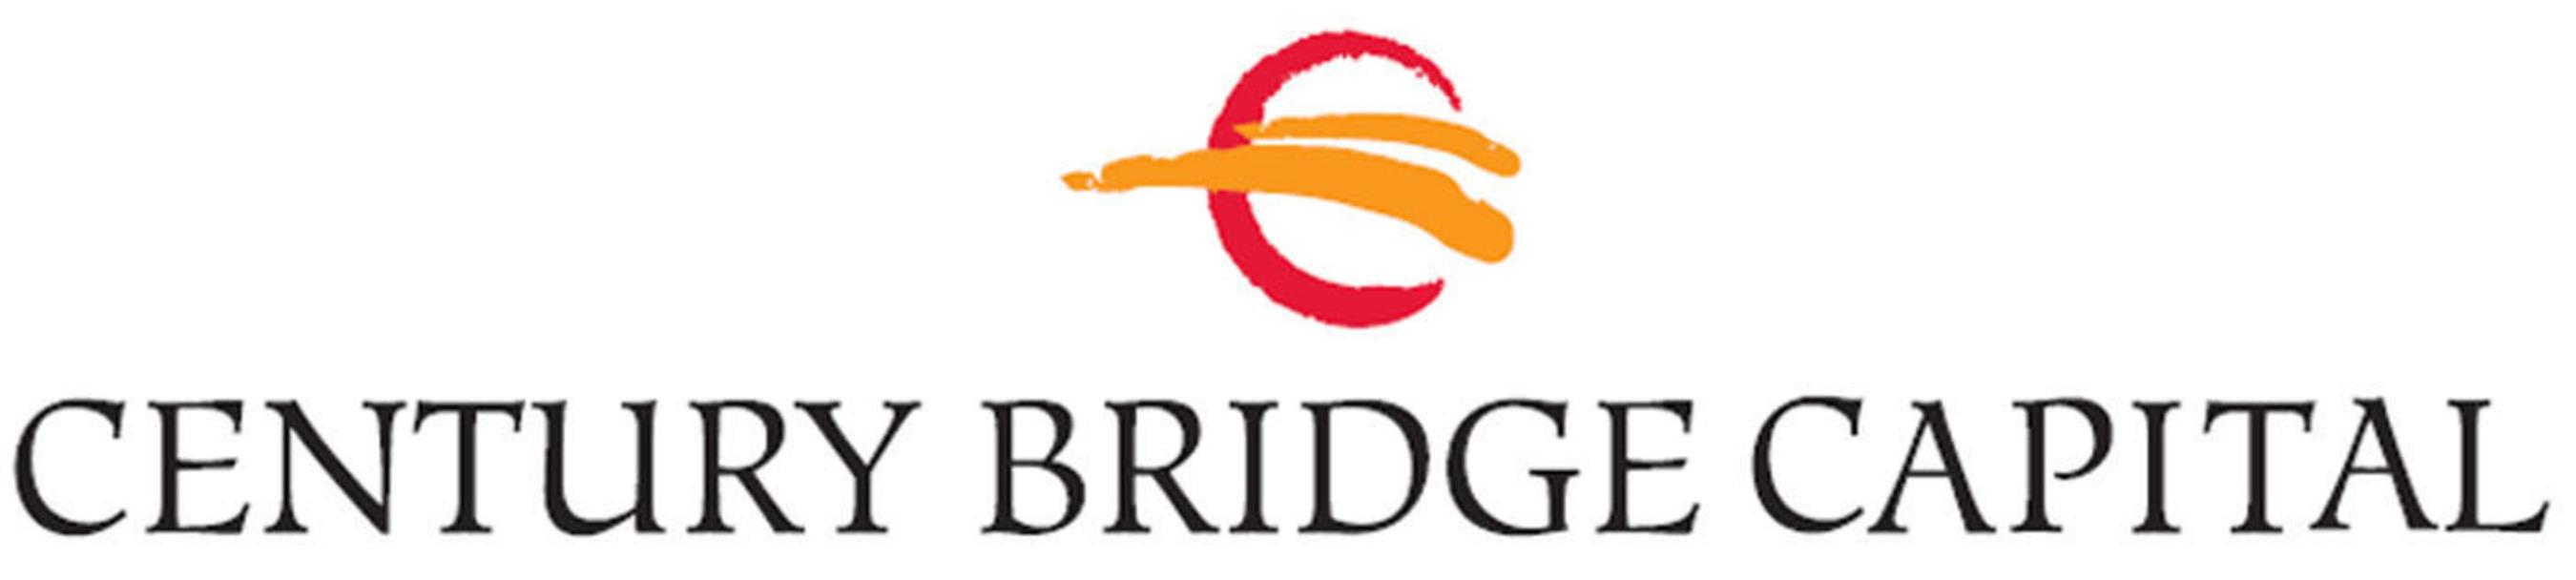 Century Bridge Capital